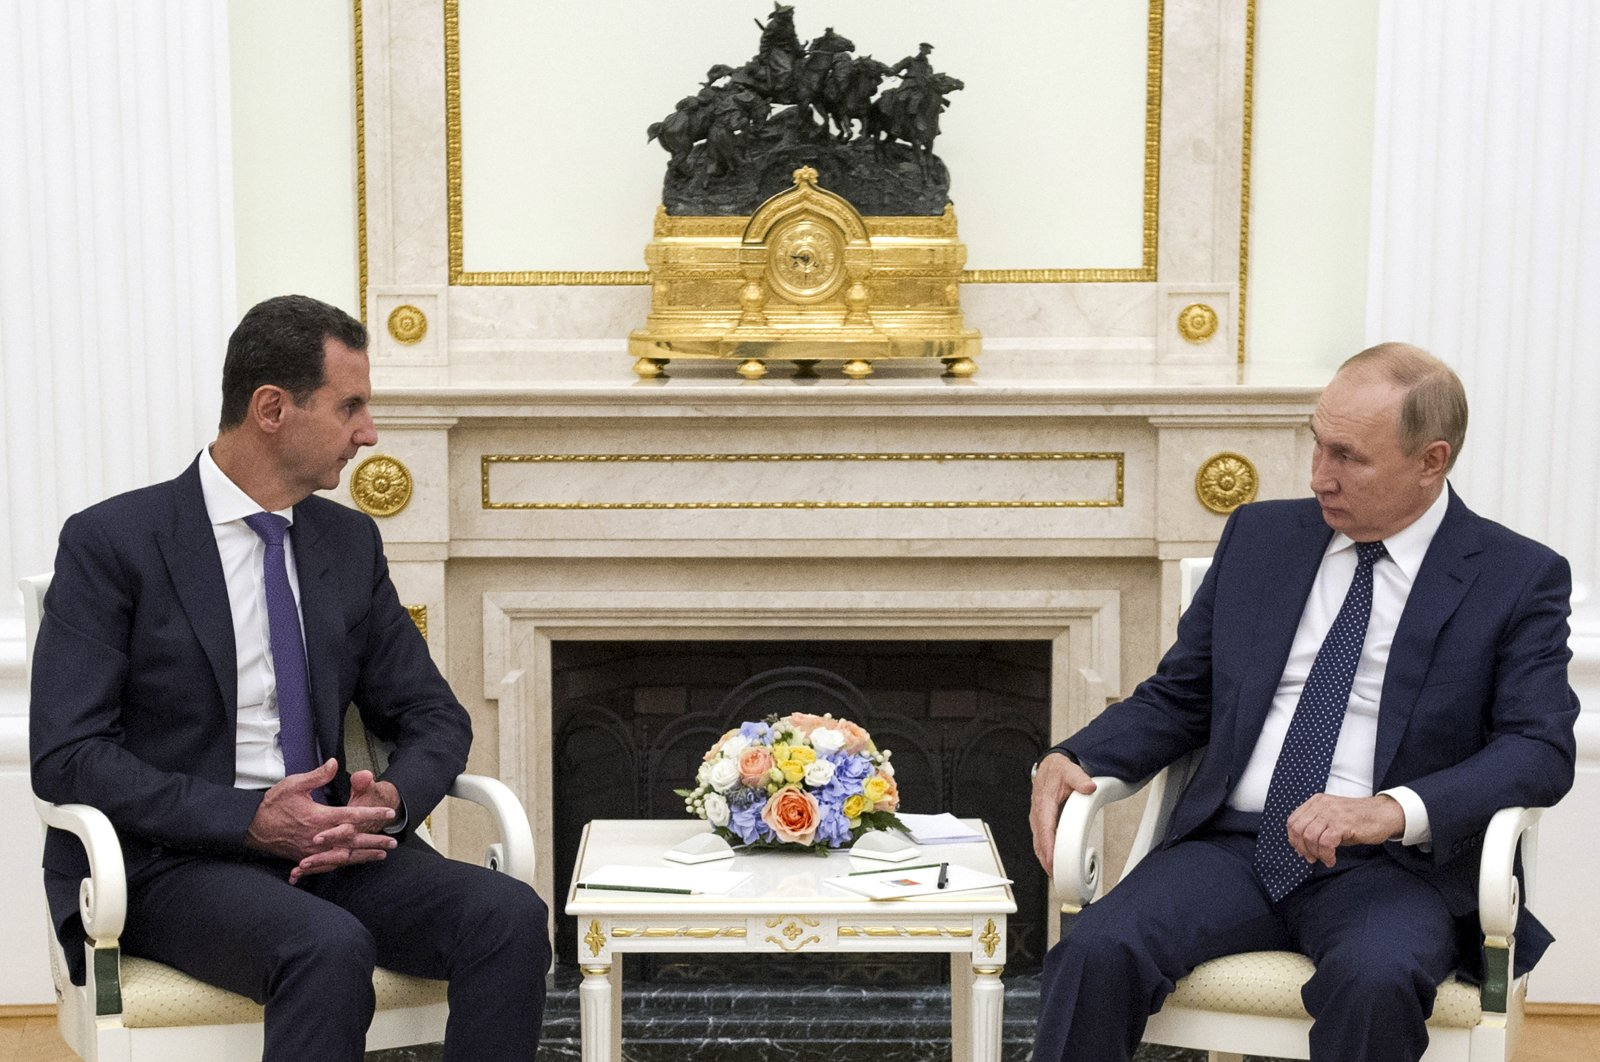 Russian President Vladimir Putin, right, listens to Syria's Bashar Assad during their meeting in the Kremlin in Moscow, Russia, Sept. 13, 2021. (Kremlin Pool Photo via AP)